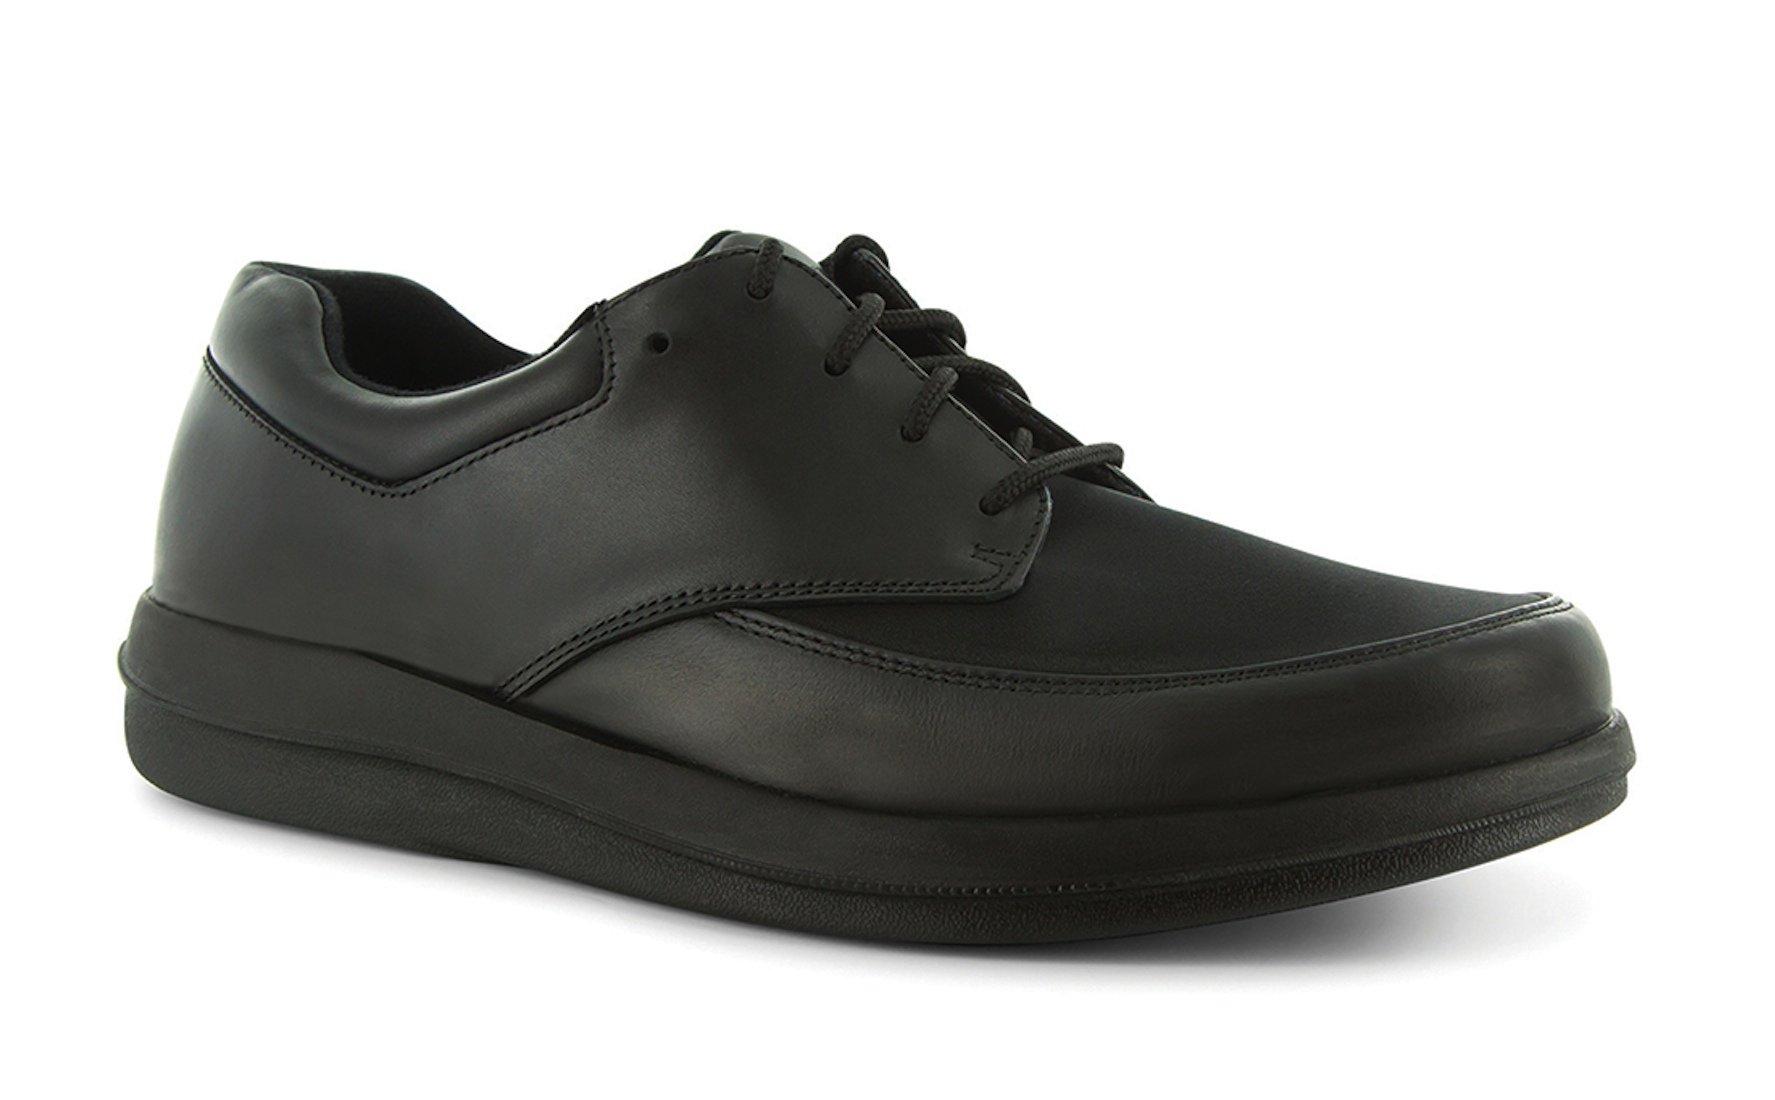 P W Minor Natural Men's Therapeutic Diabetic Extra Depth Shoe: Black 15 Wide (E) Lace by P.W. Minor (Image #1)